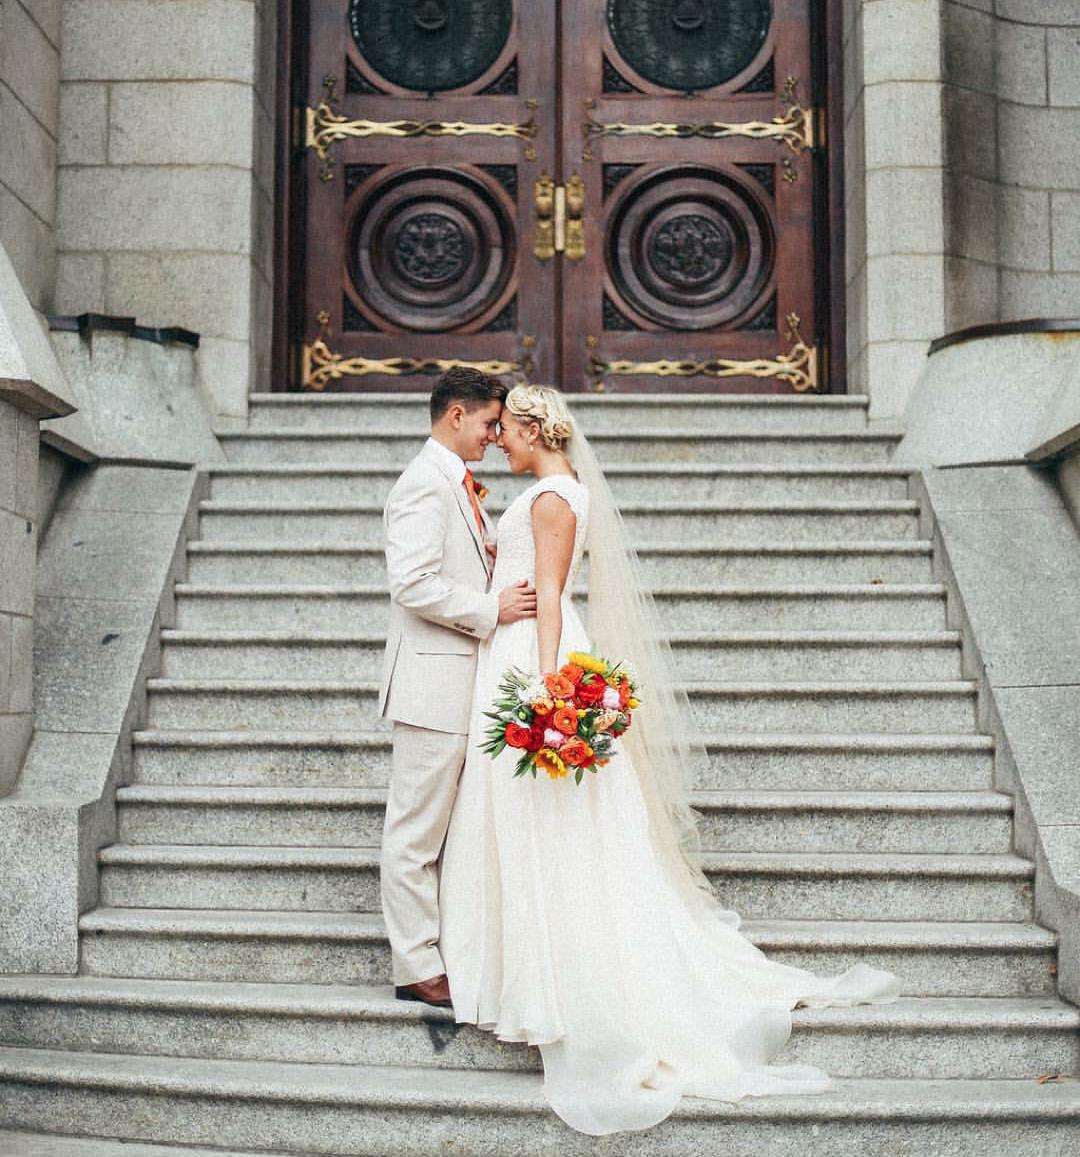 Flowy wedding dress with sleeves  modest wedding dress with cap sleeves and a flowy skirt from alta